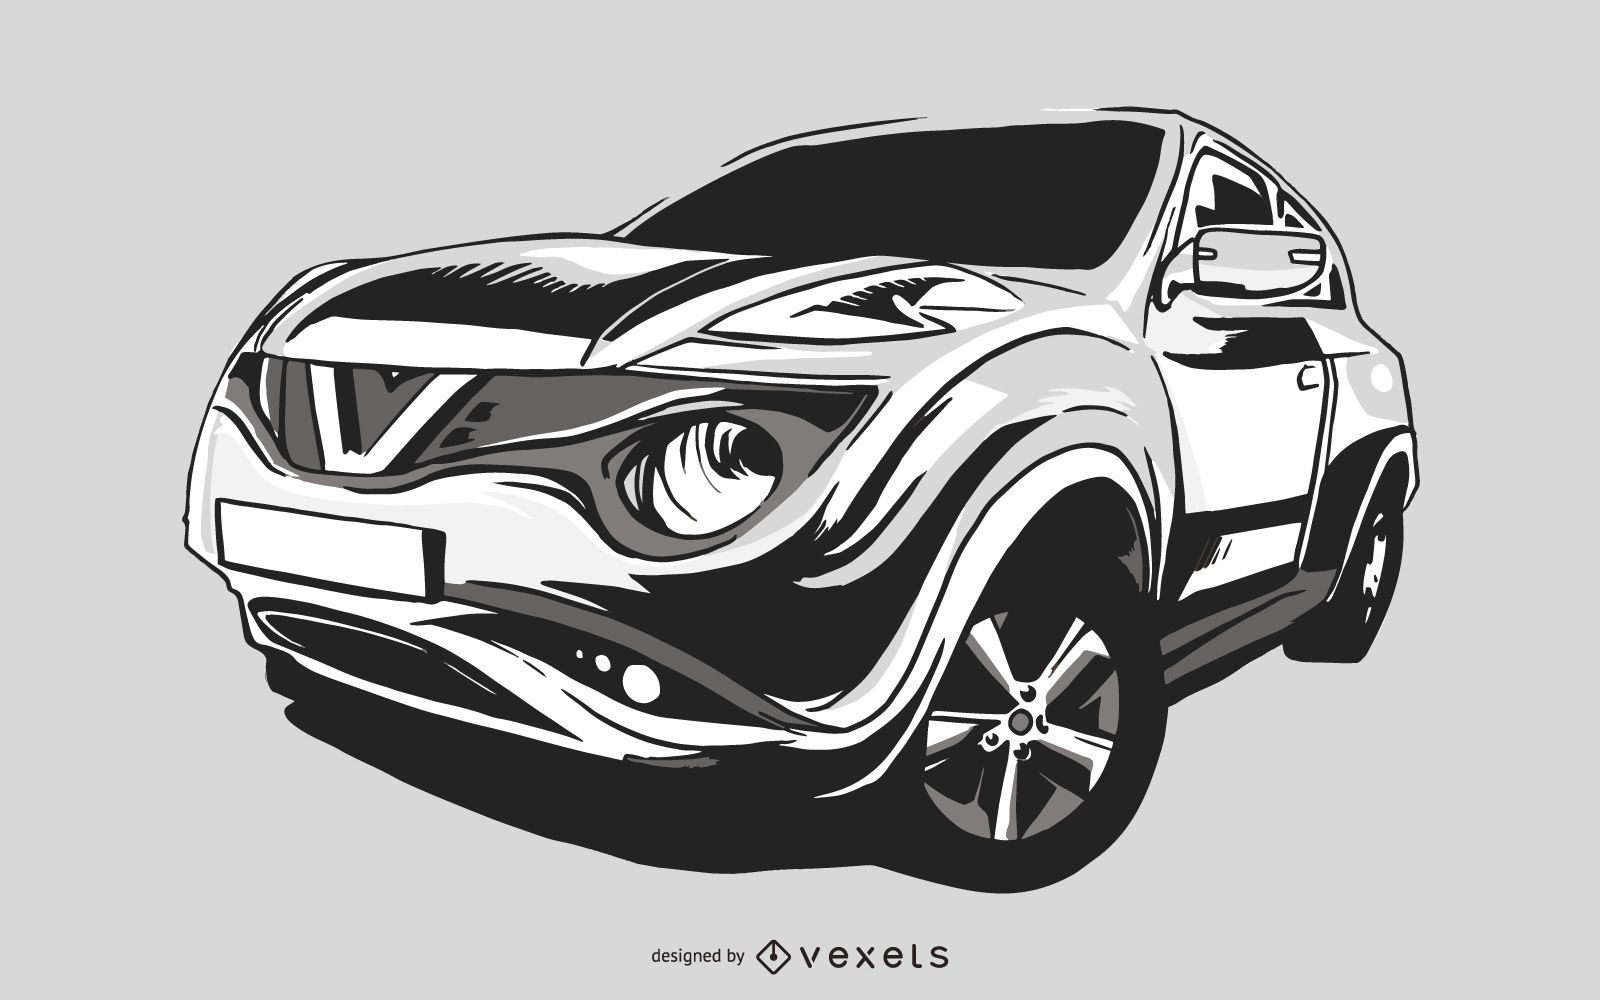 Imagen vectorial de coche deportivo